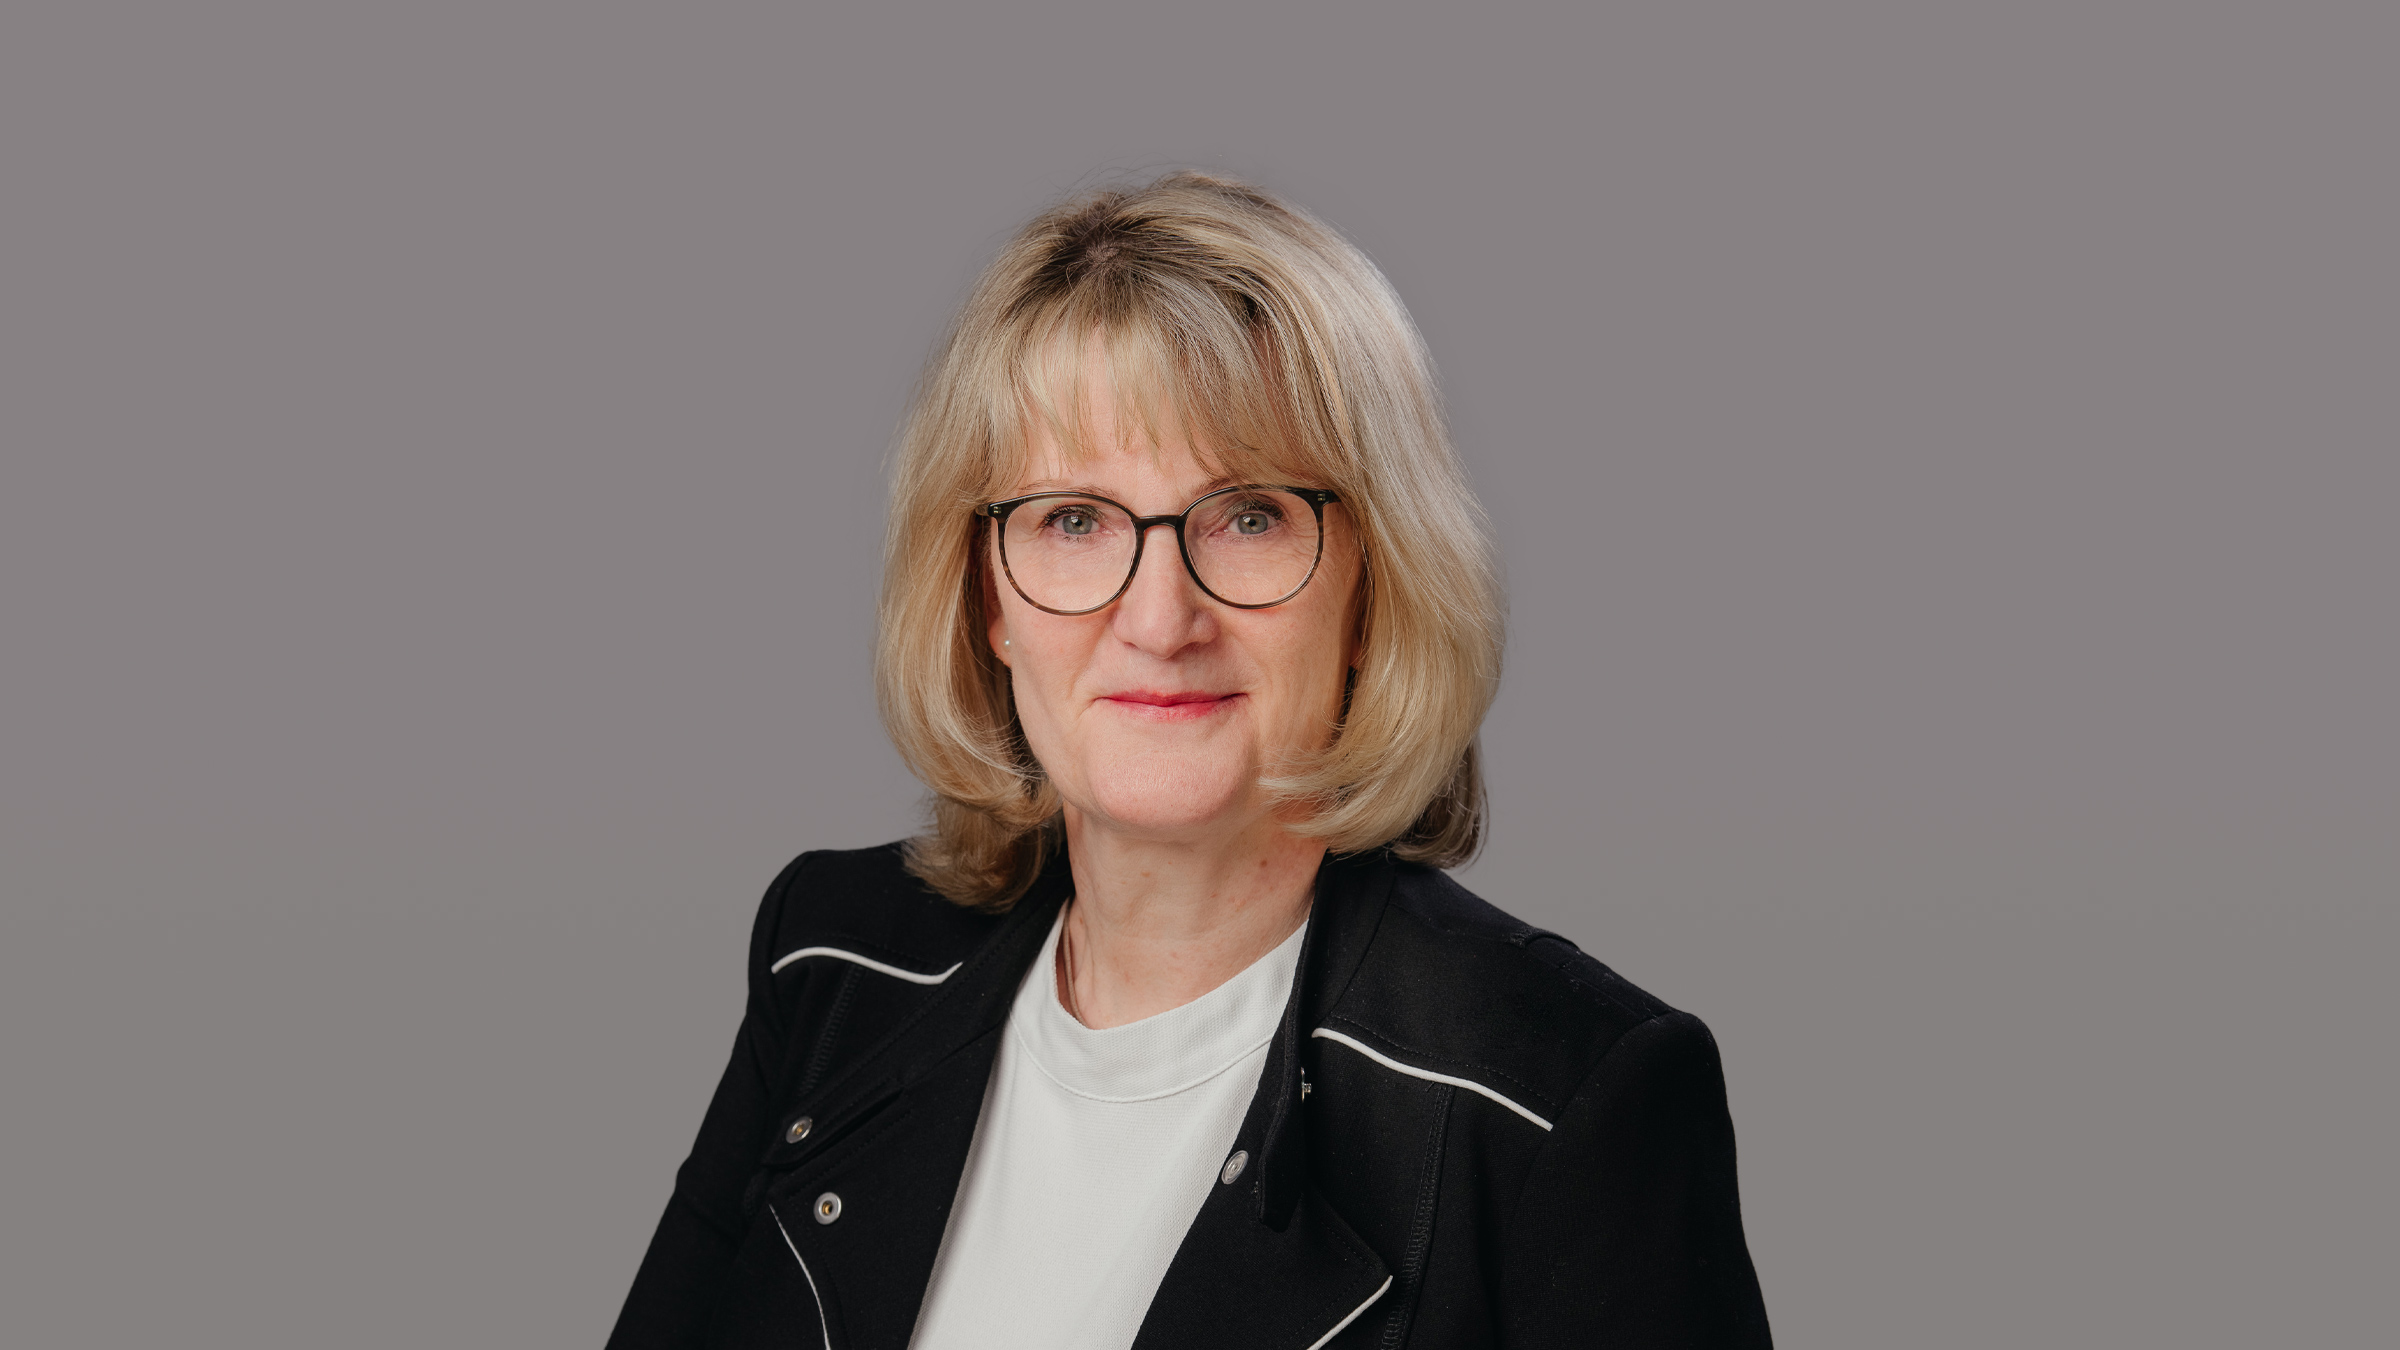 Arica Kopp